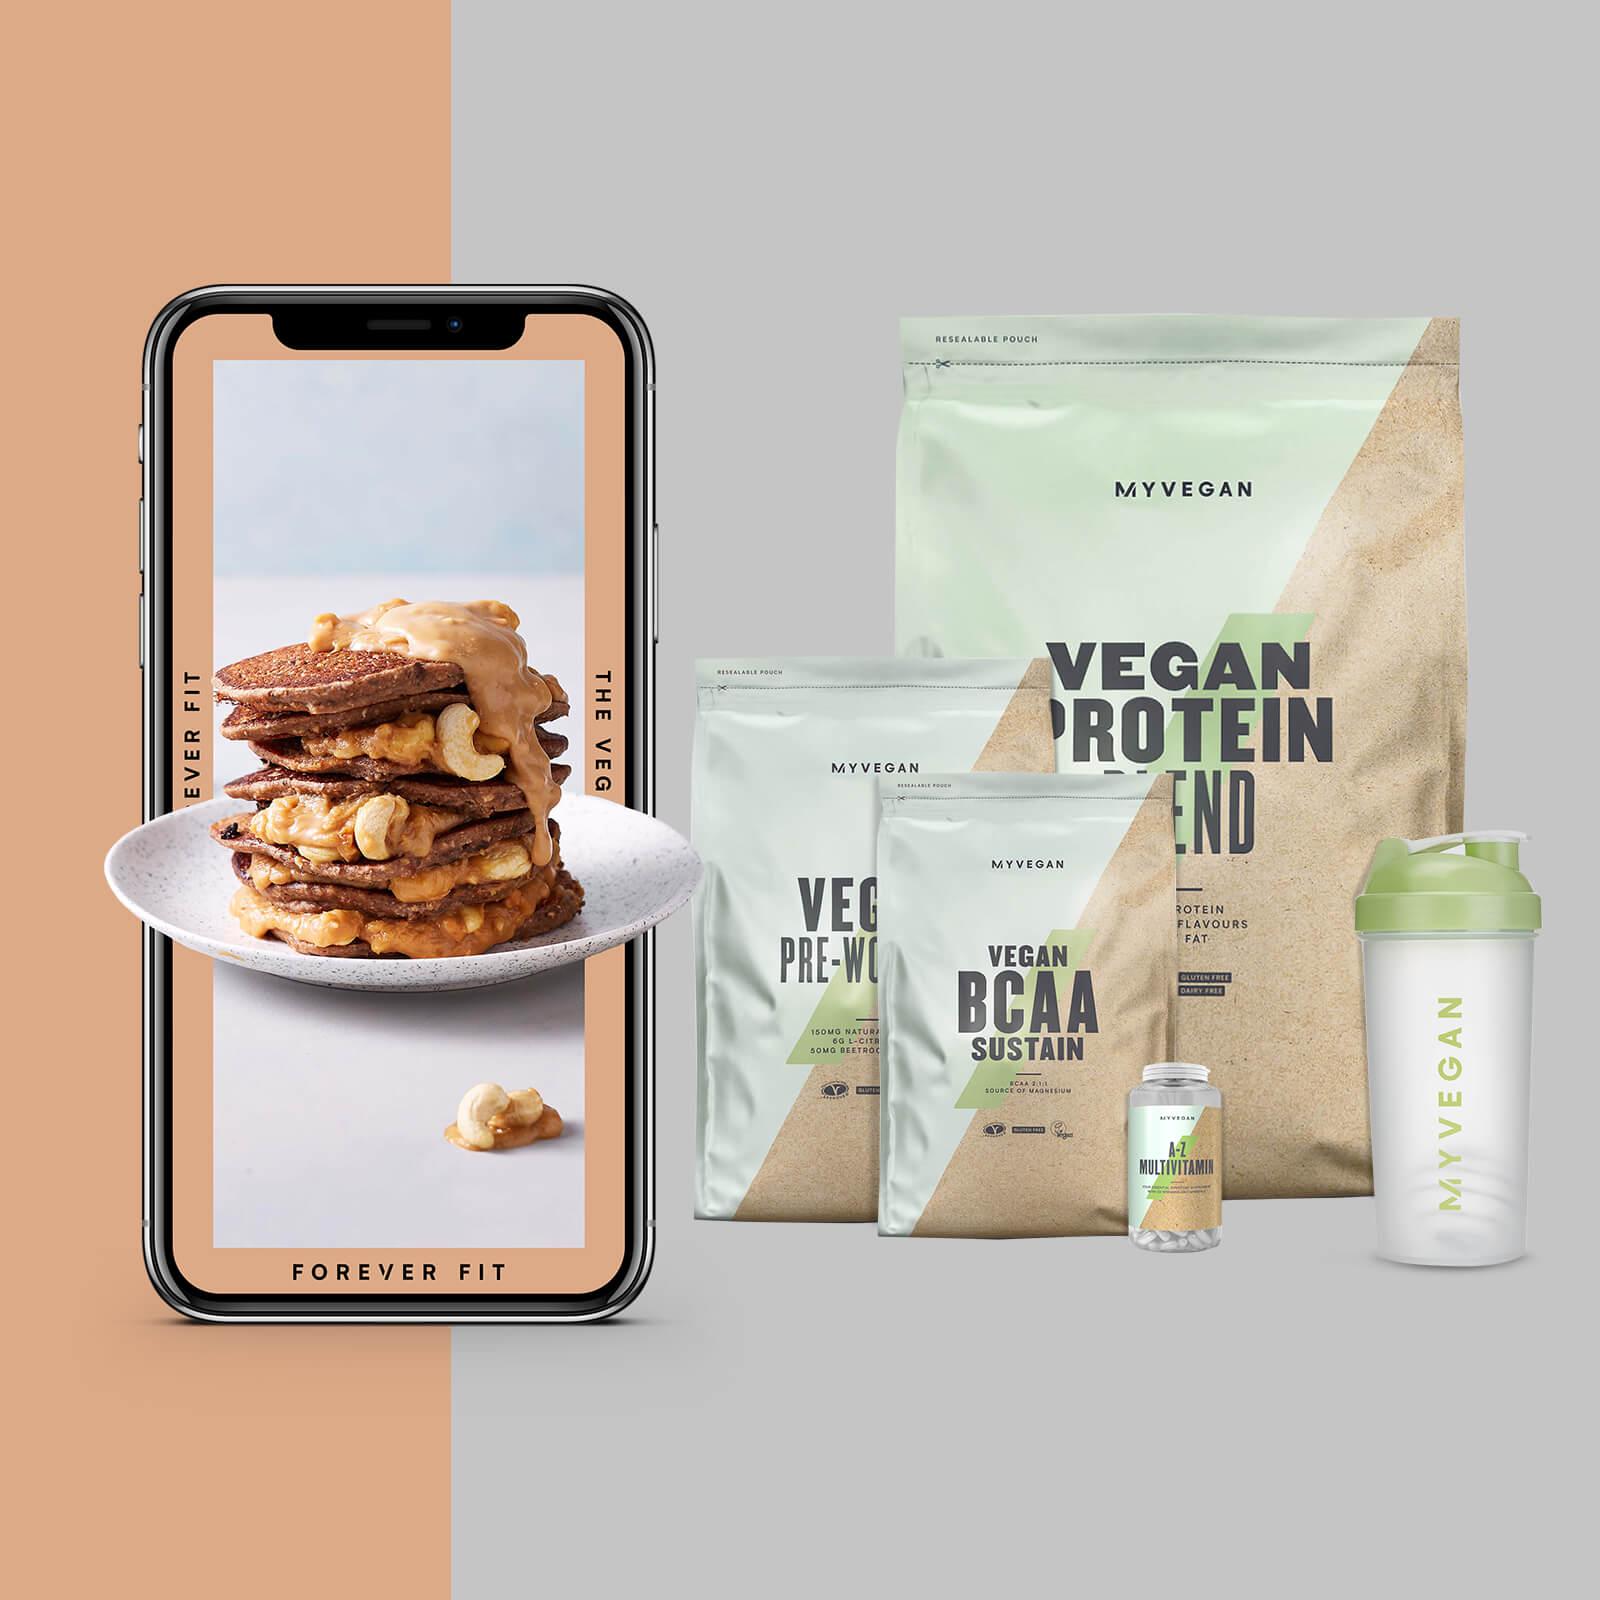 Le Pack Vegan + Guide Entraînement et Nutrition Offert - Orange - Lemon Tea - Coffee and Walnut